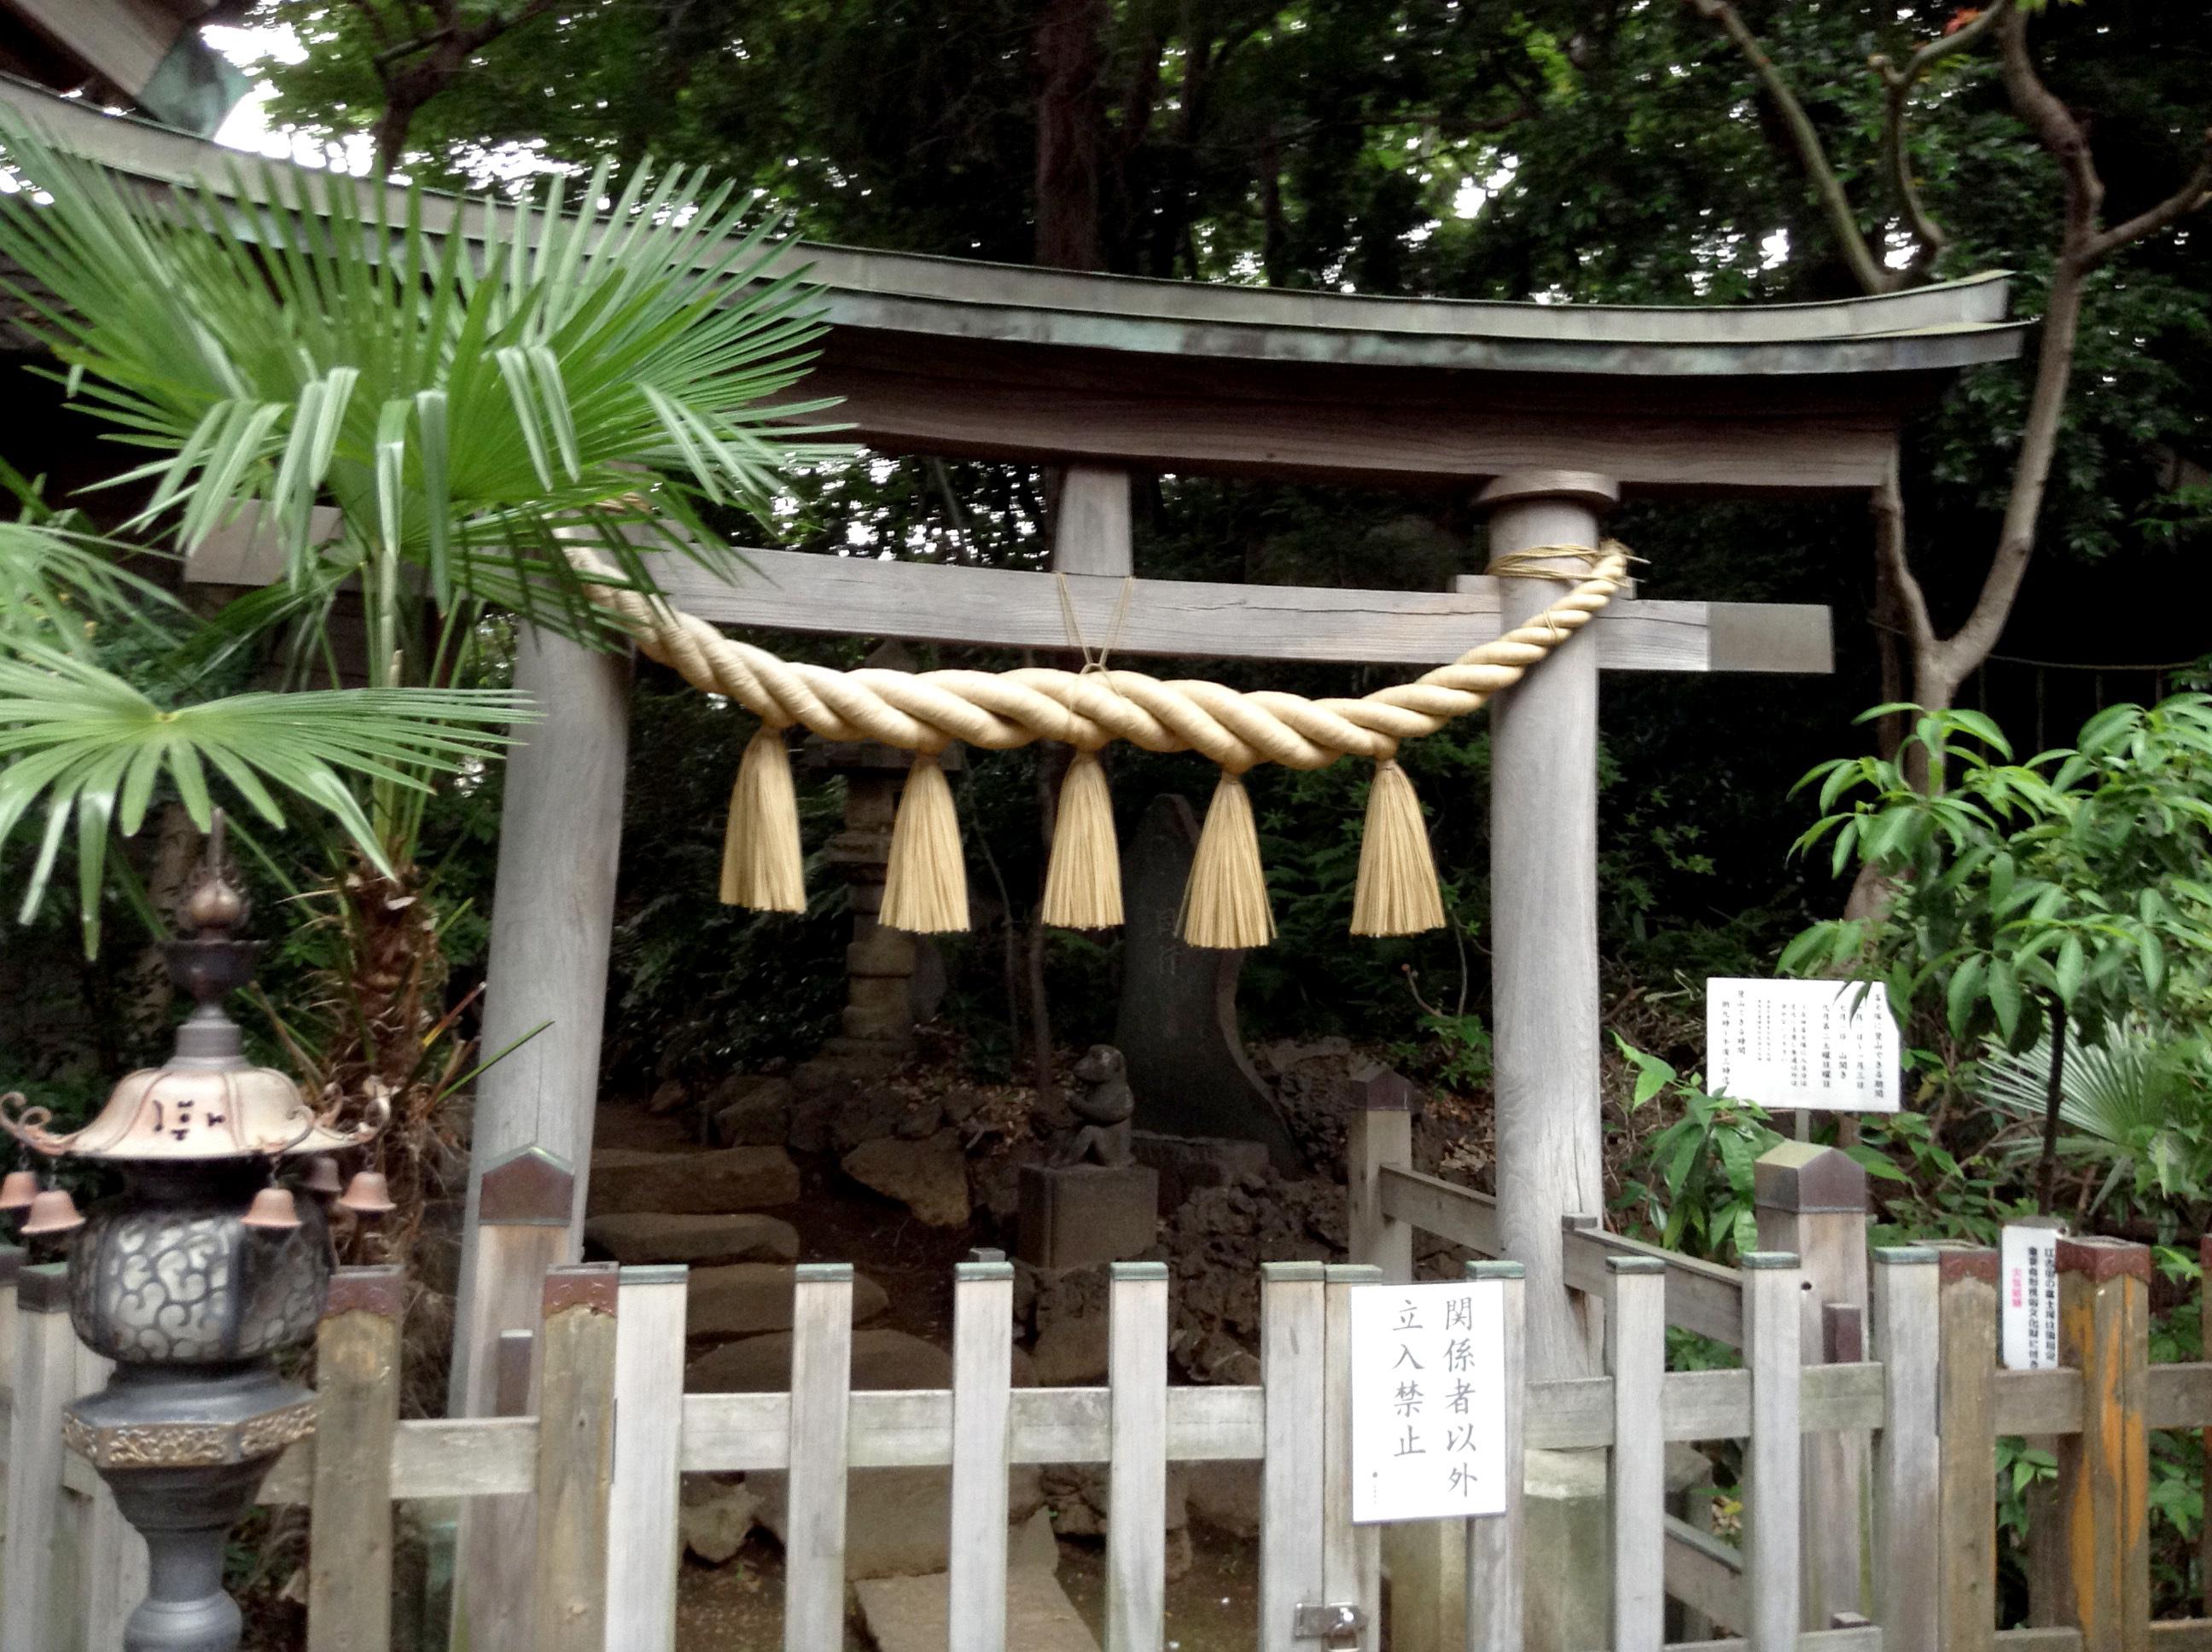 Climb a miniature Mount Fuji at Asama Shrine